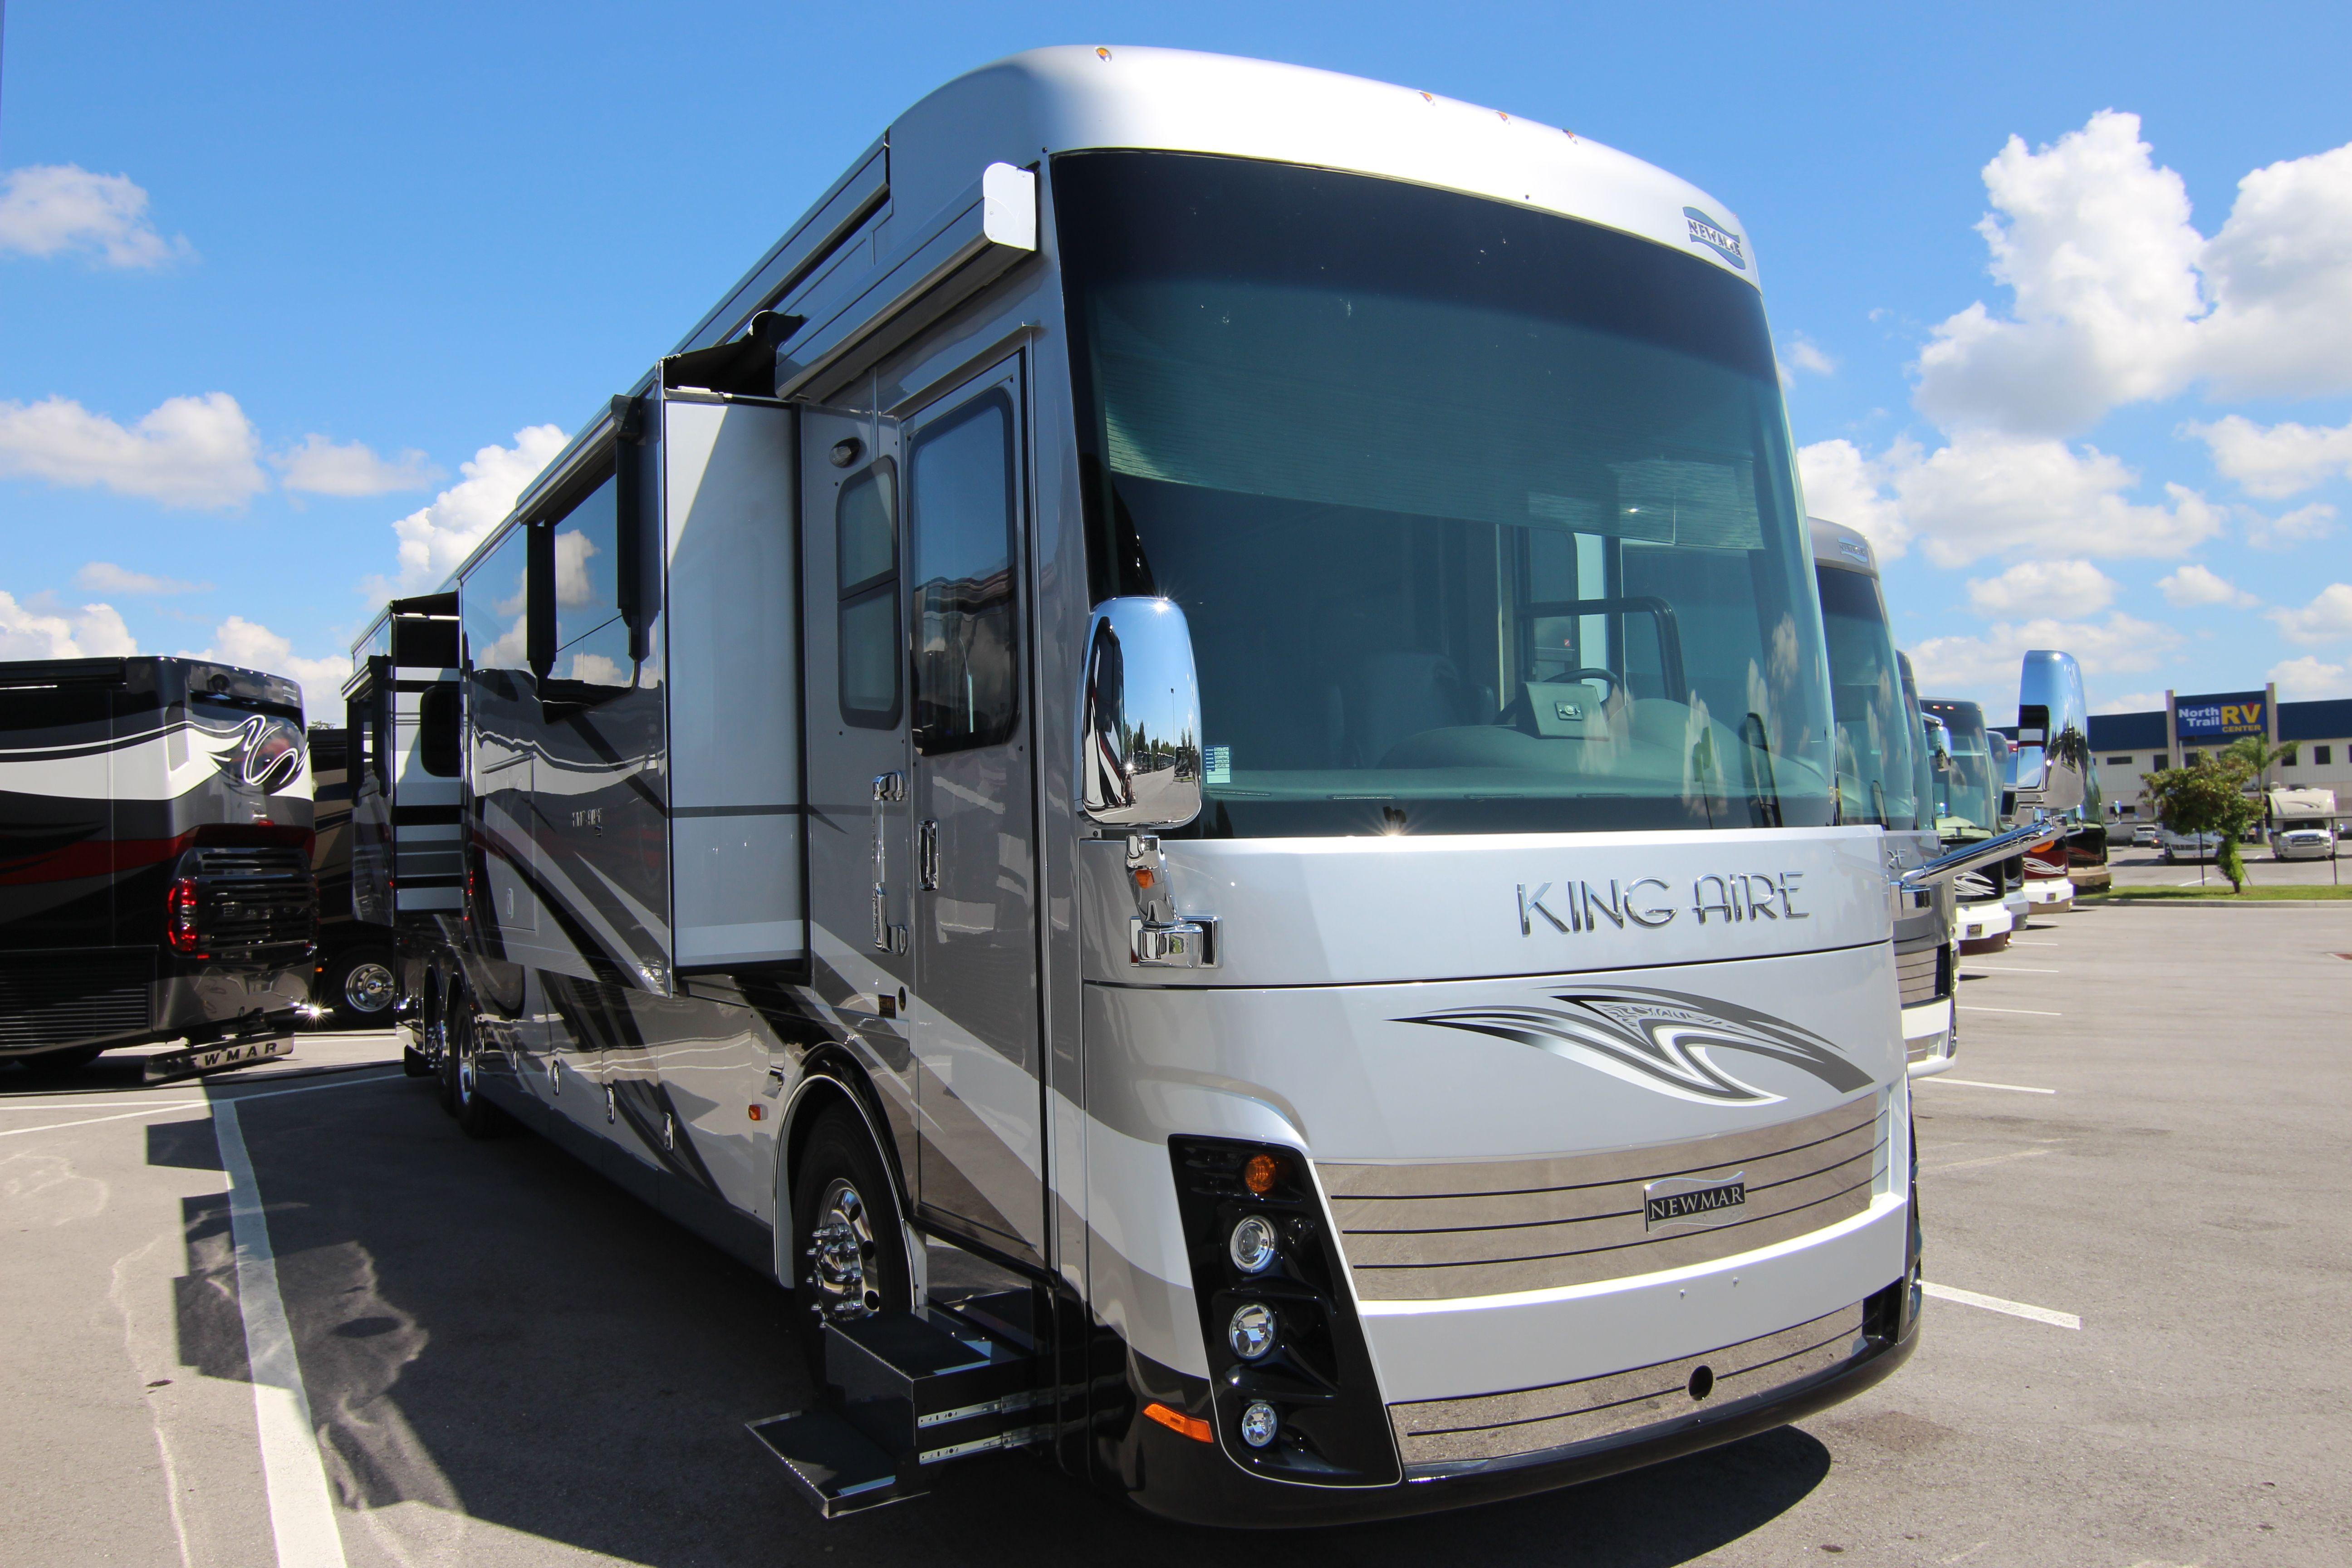 2016 King Aire Florida rv, Bus motorhome, Recreational